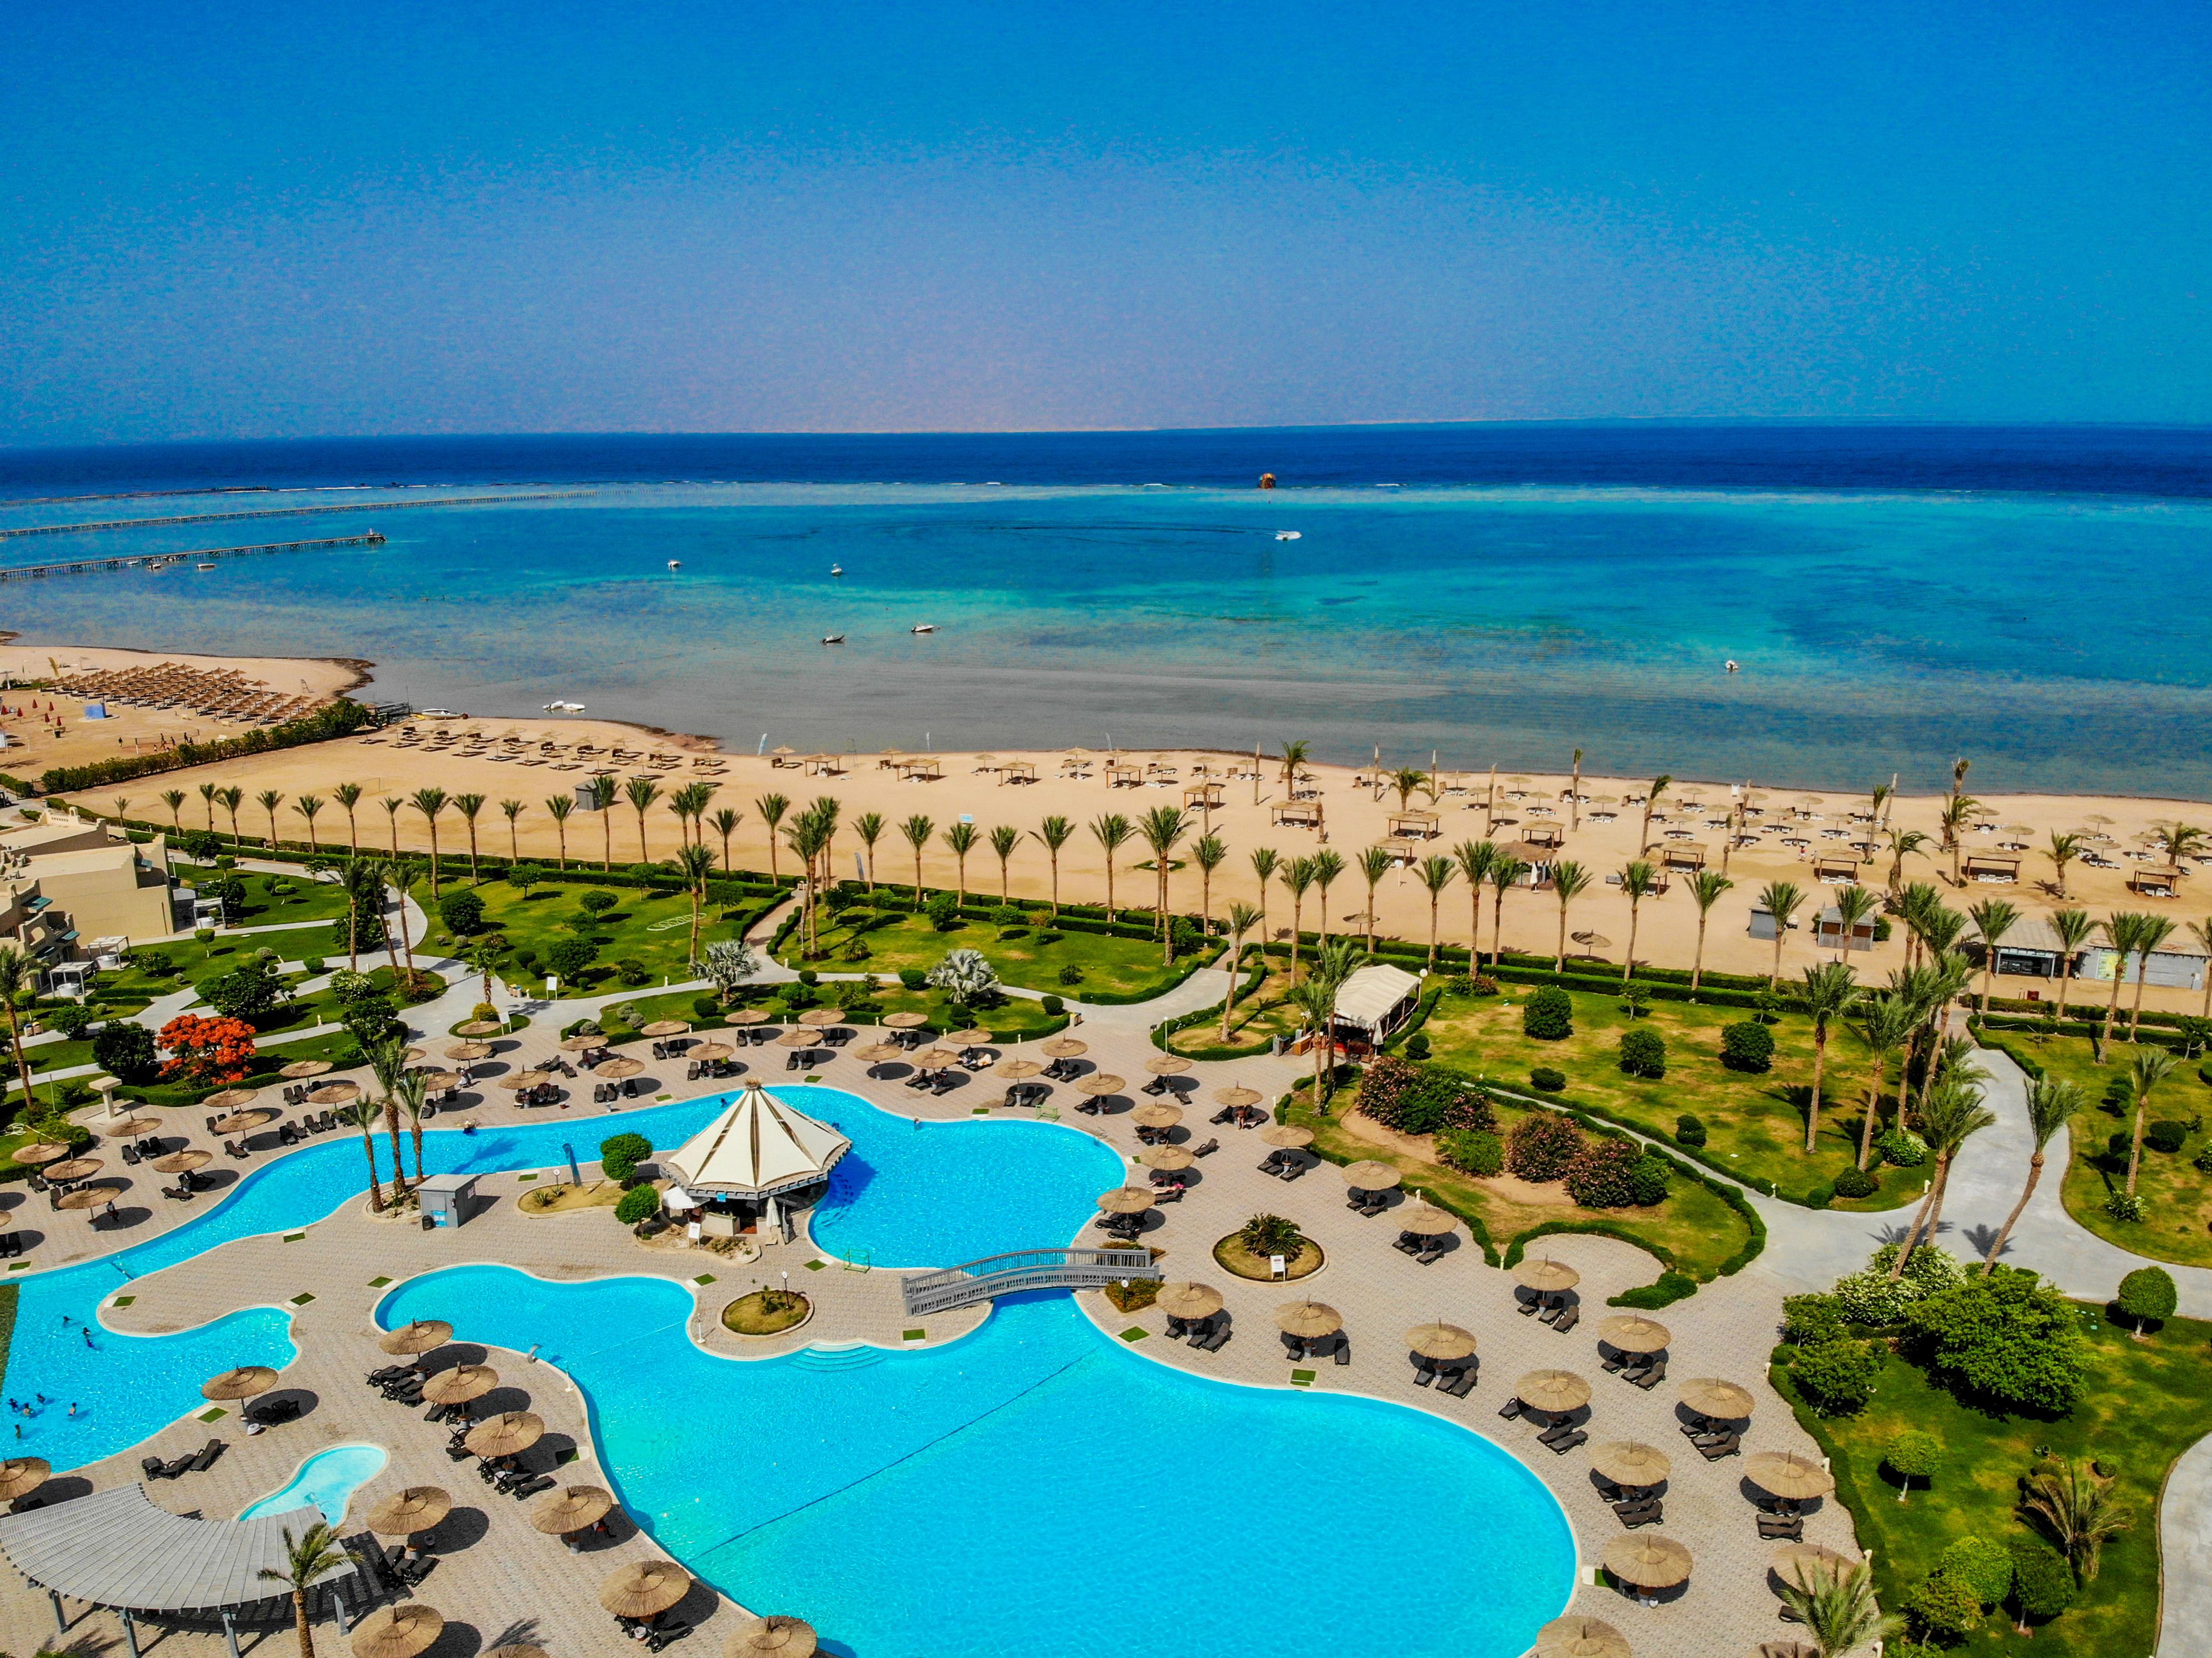 NICOLAUS CLUB CORAL SEA WATER WORLD | Sharm el Sheikh